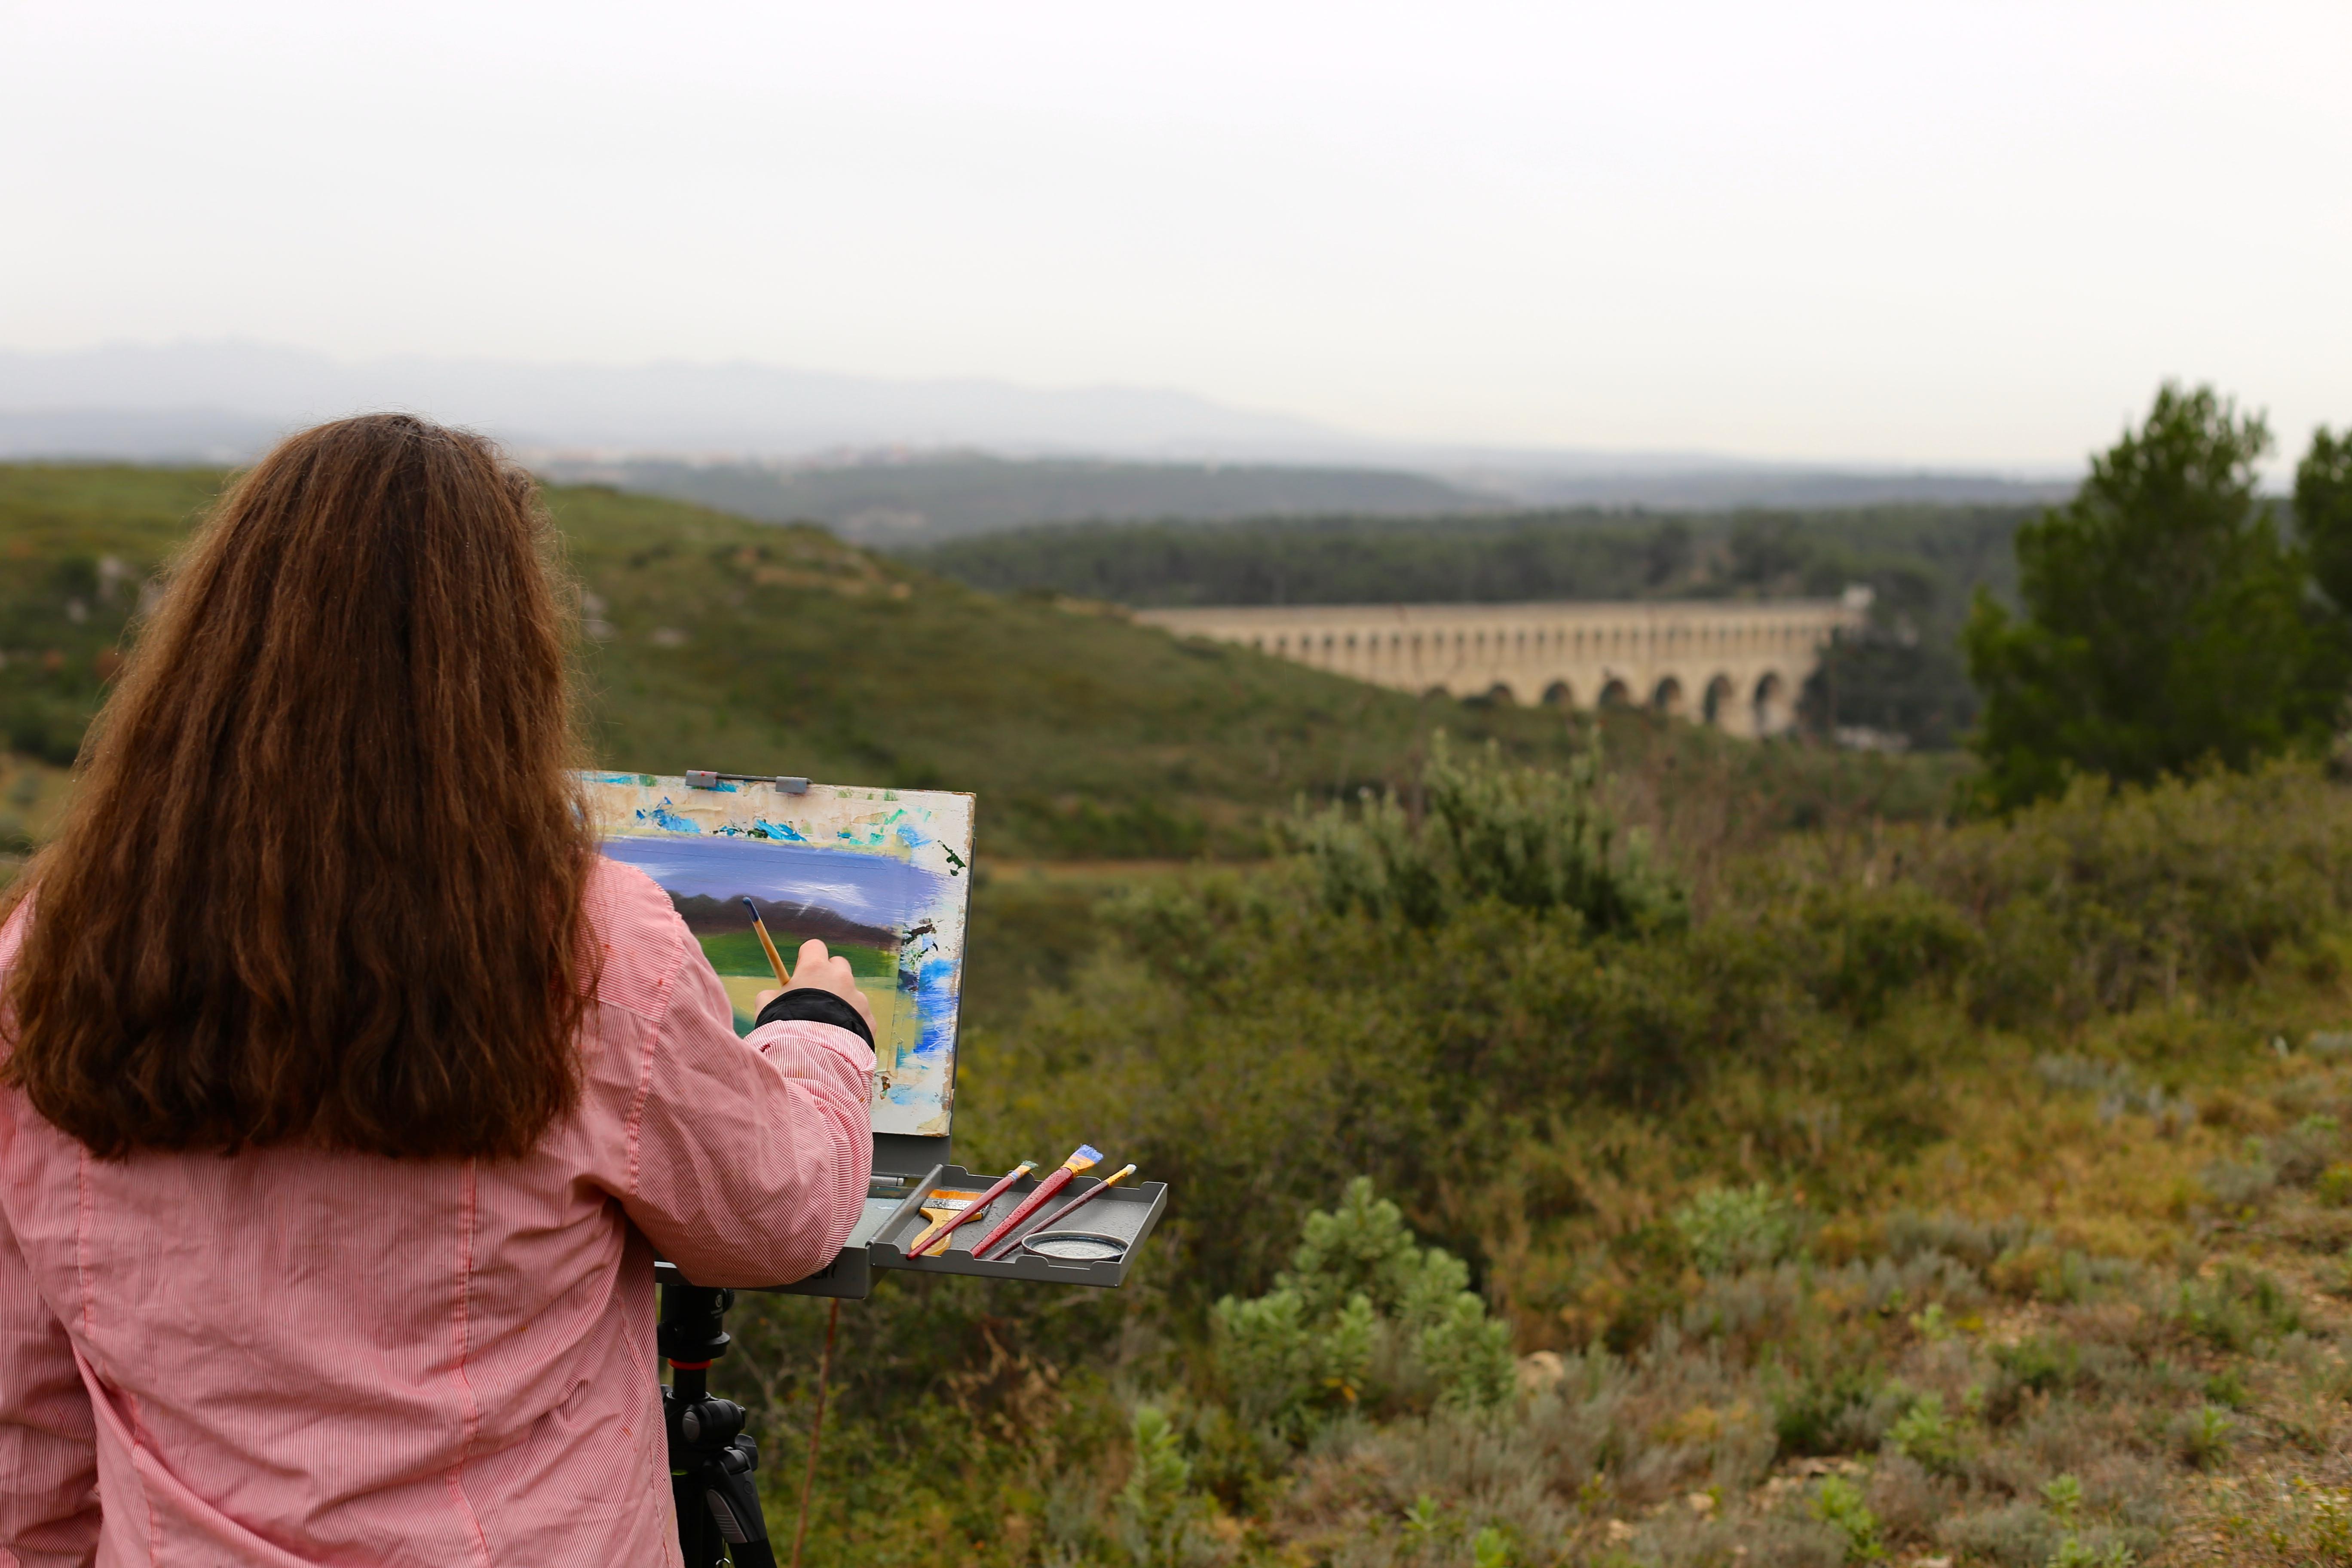 European Art Classroom, Proctor Academy, Aix en Provence, France